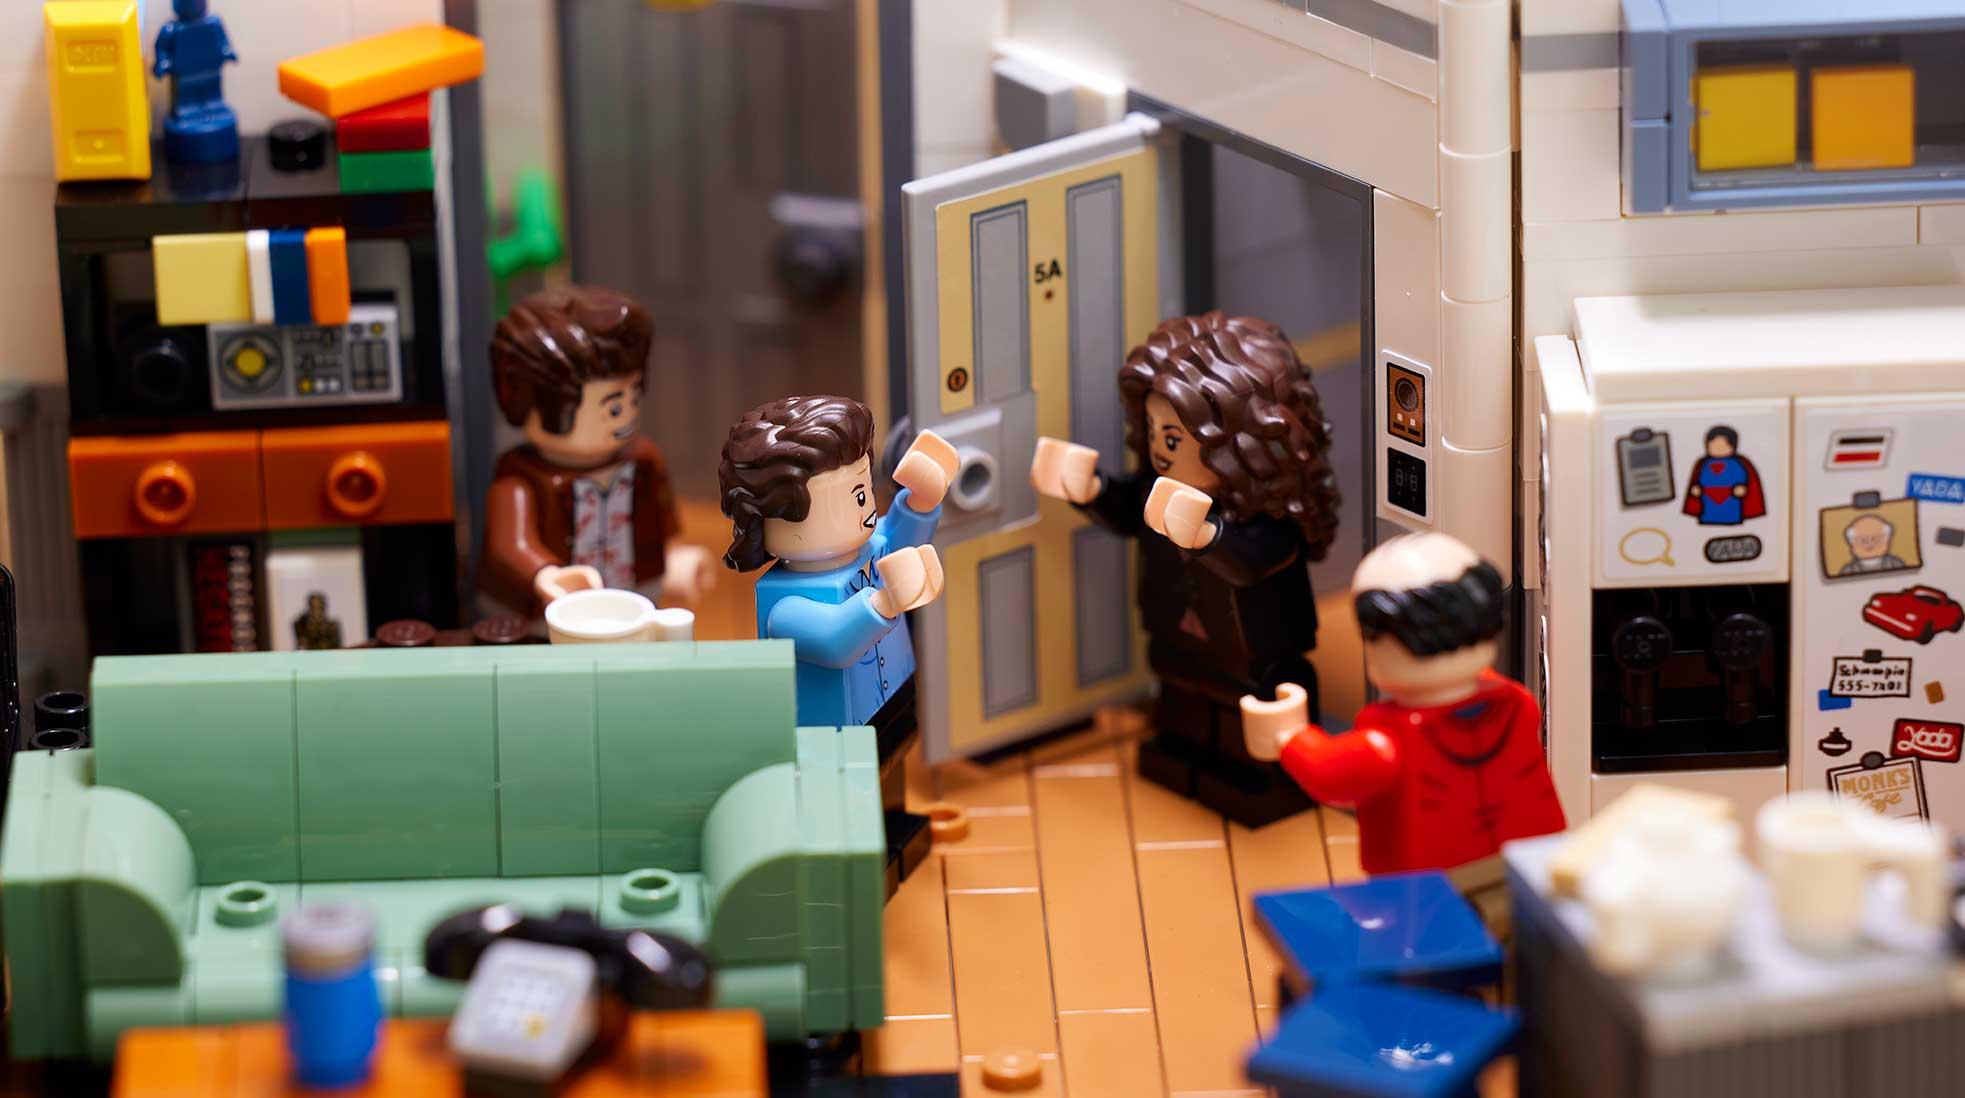 The Seinfeld Lego Ideas set